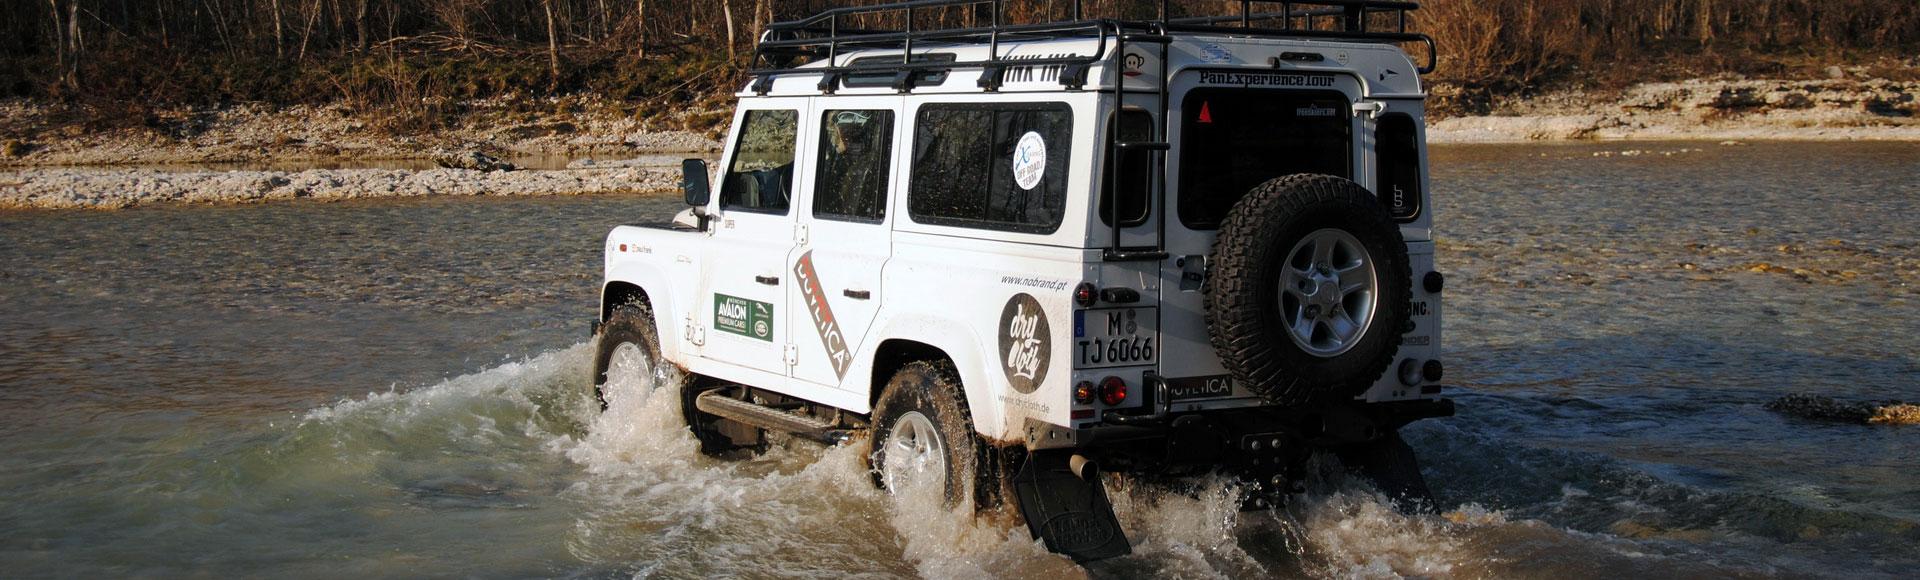 Land Rover Defender Gradisca 4x4 2016 Herbst_3656